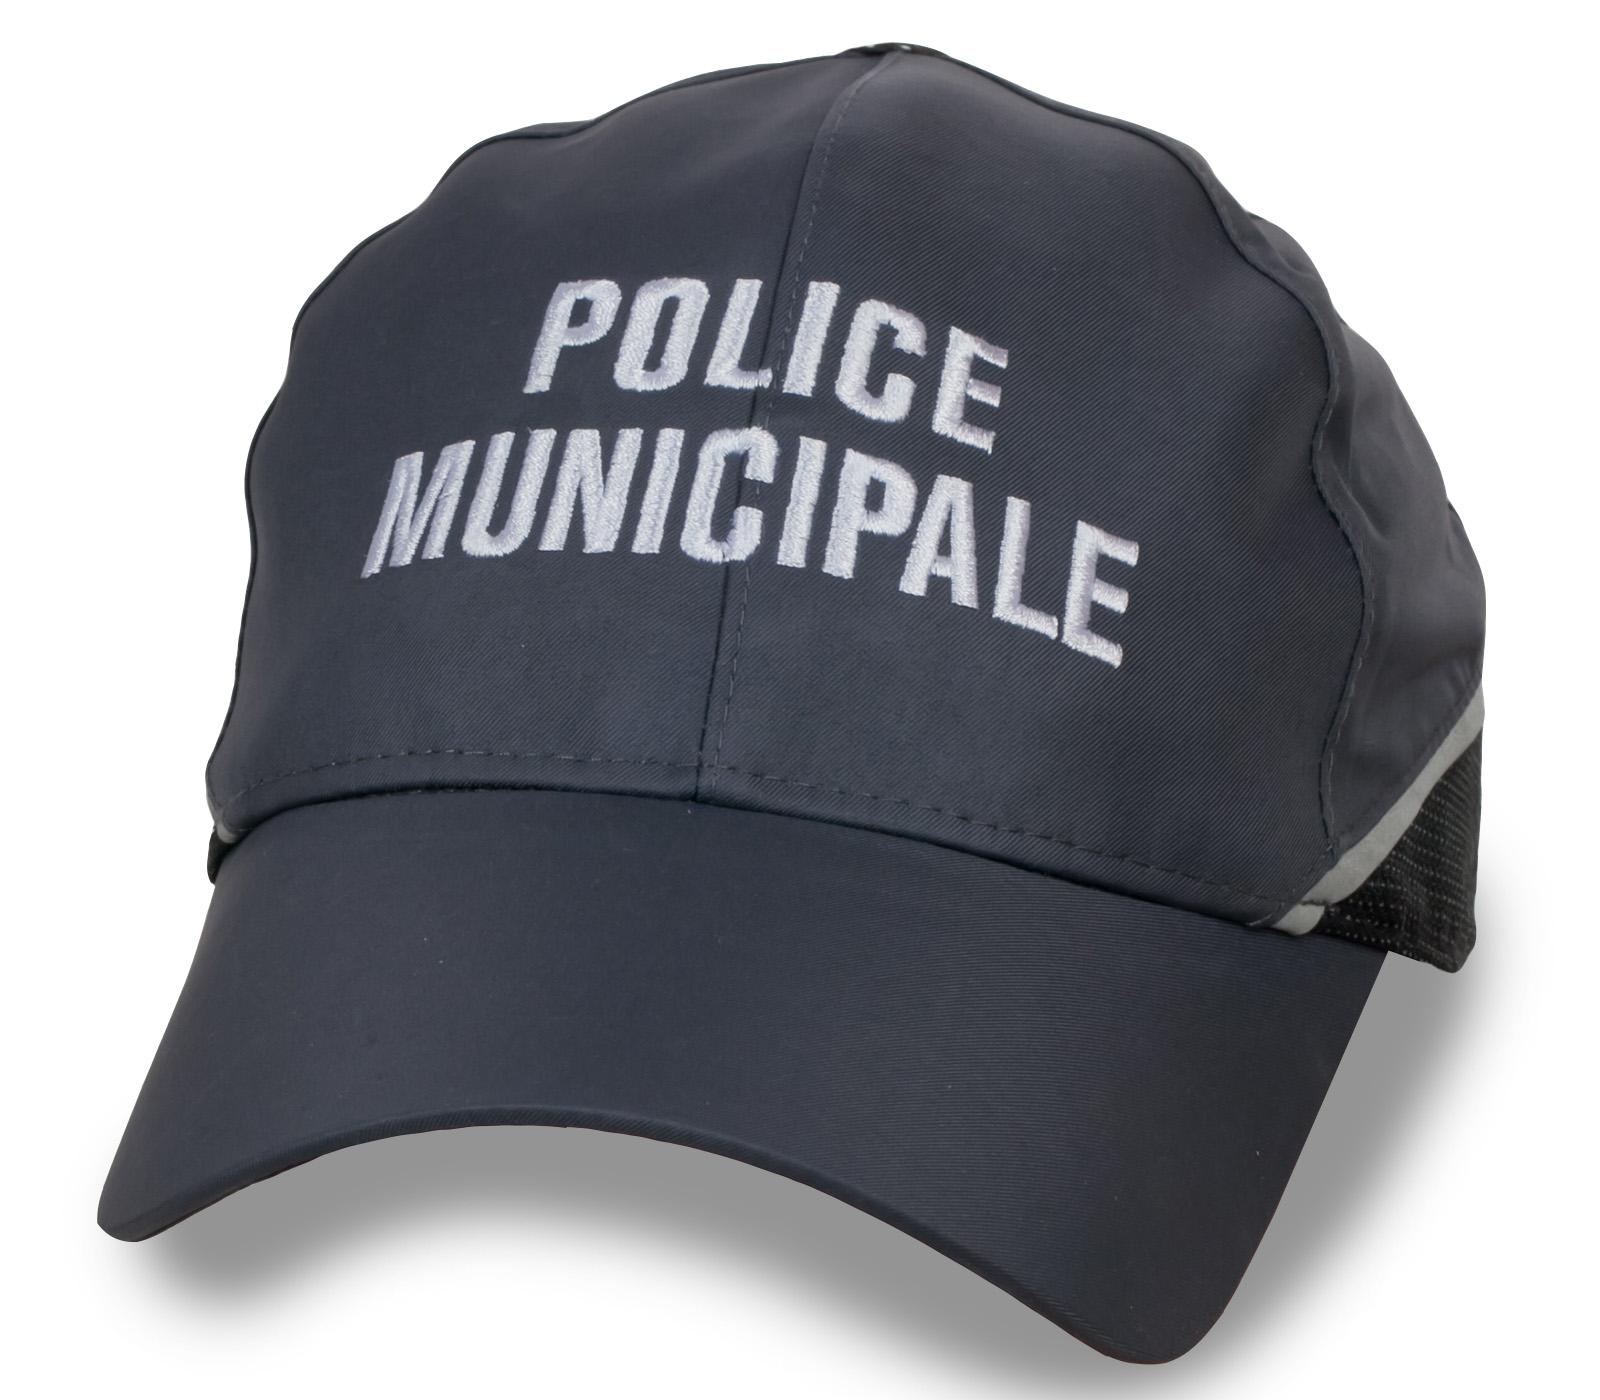 Брутальная мужская кепка с надписью Police Munisipale